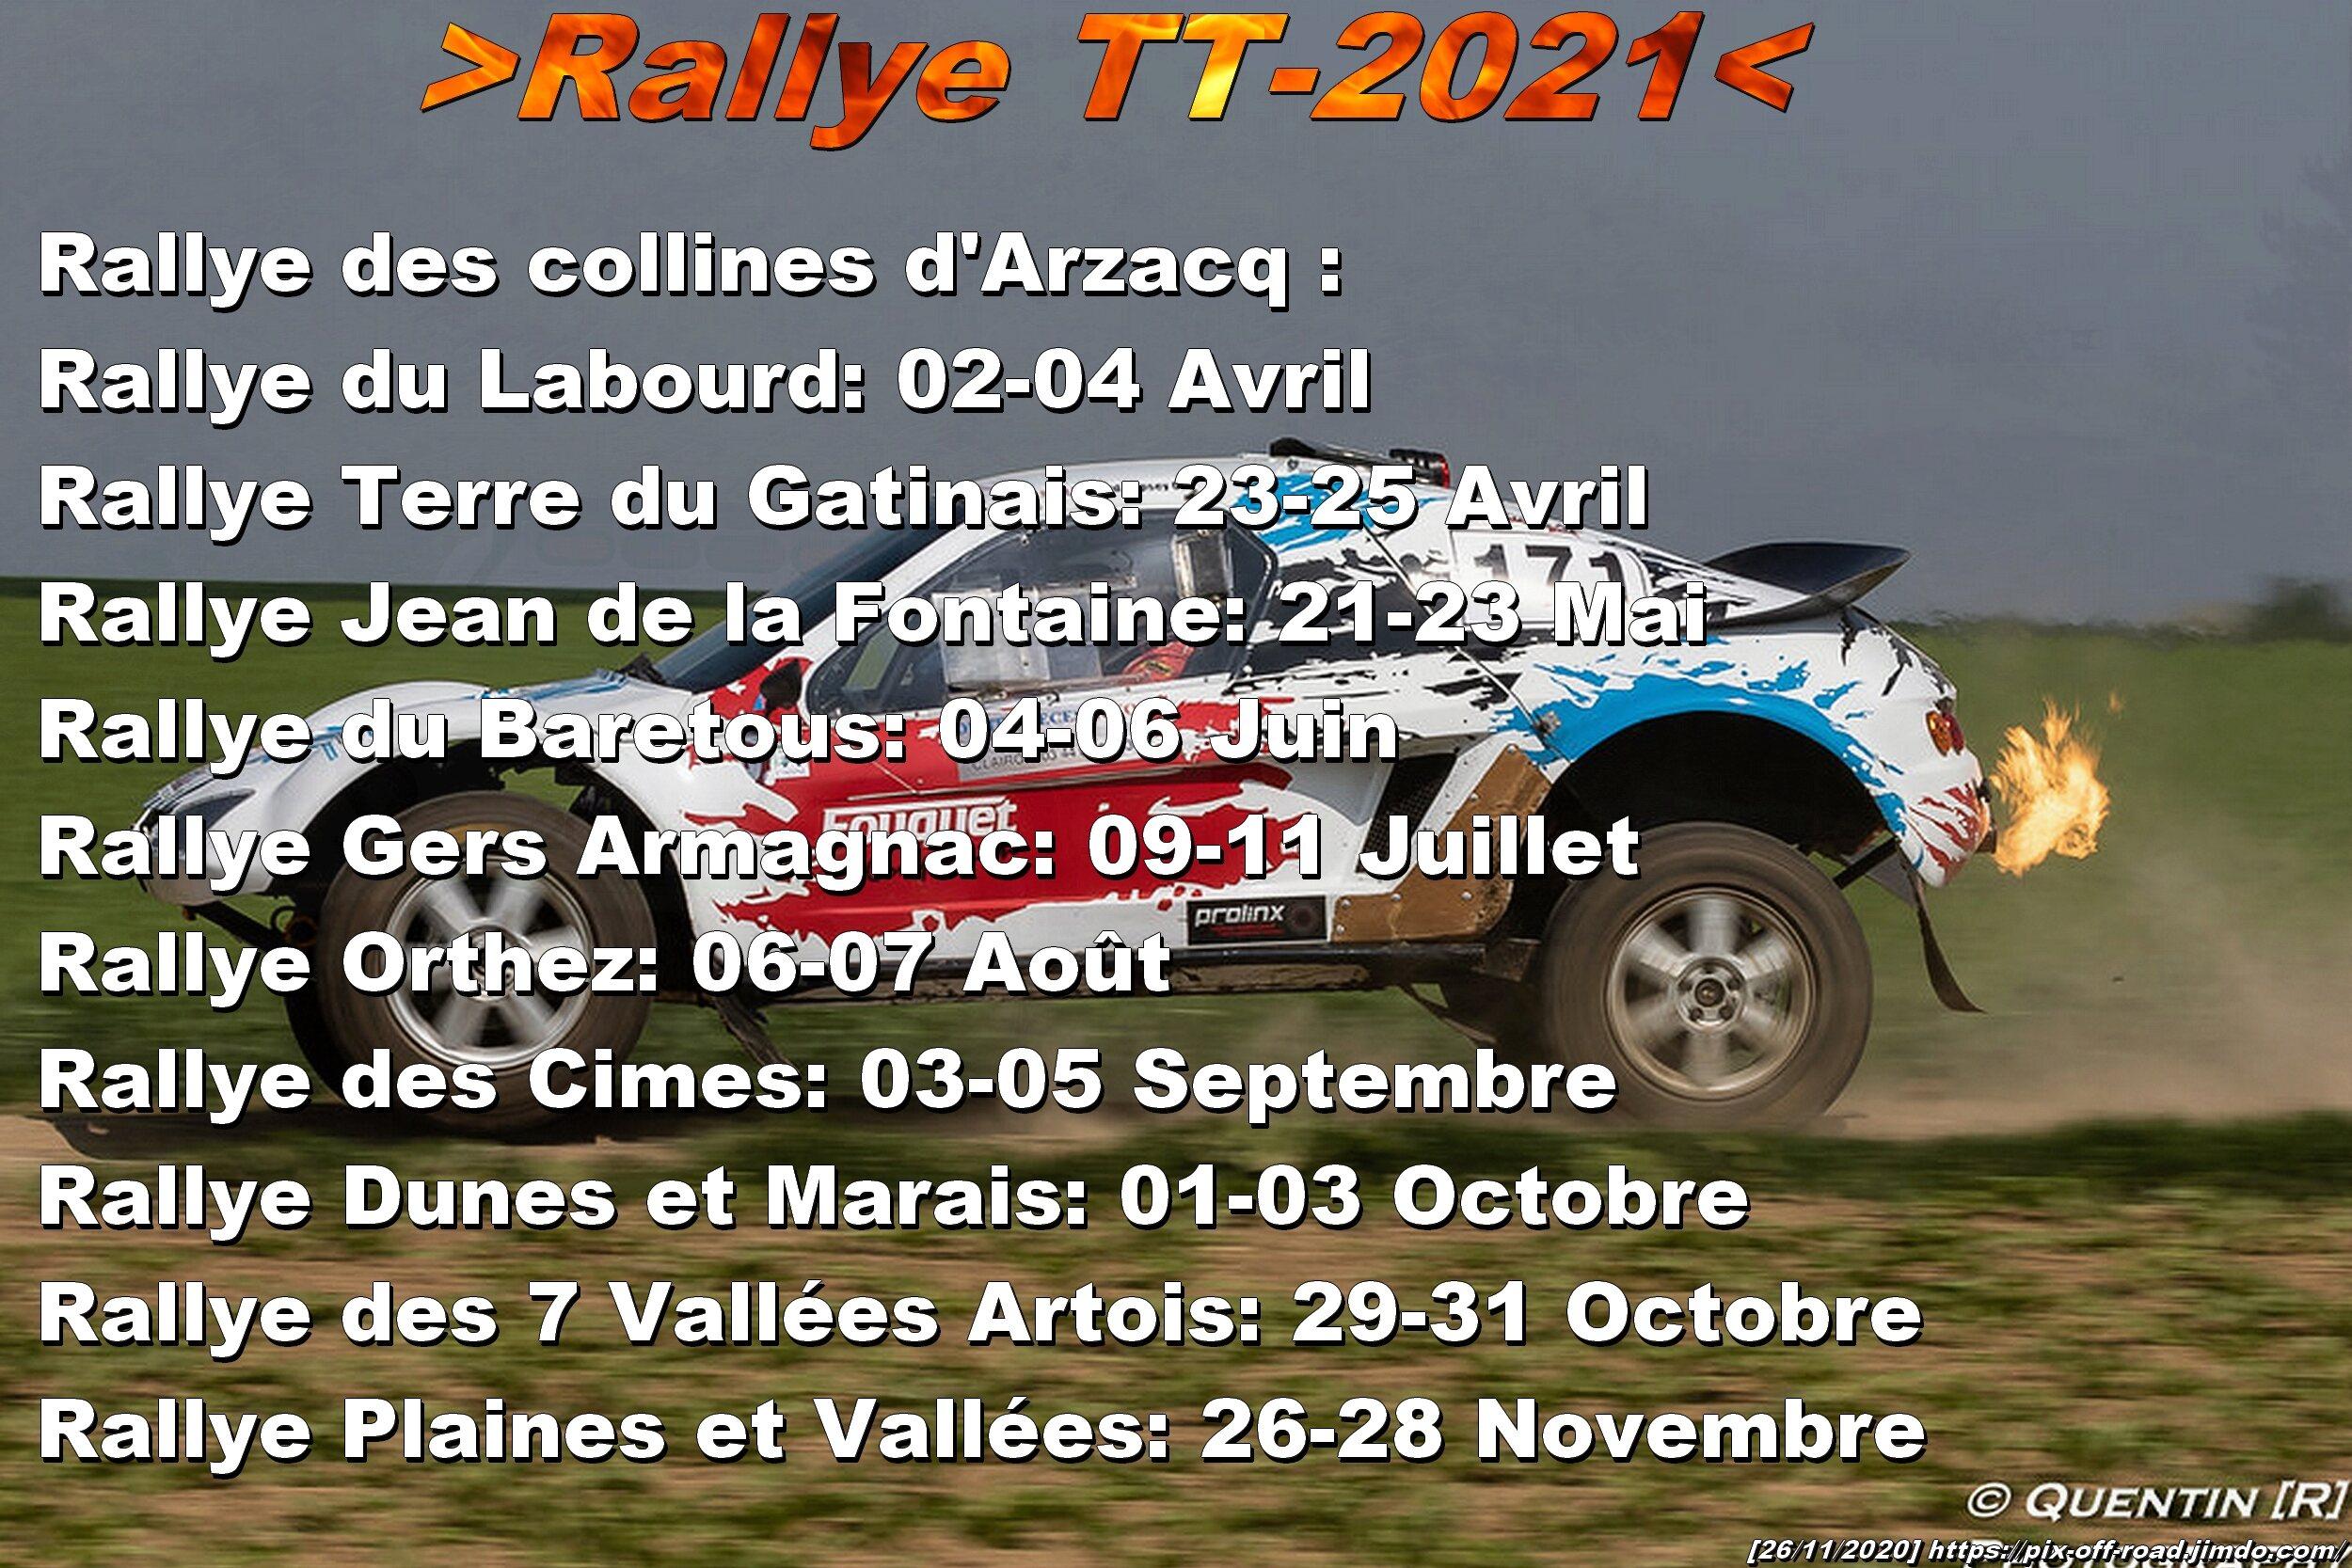 Rallye TT   Pix Off Road : Agence photo